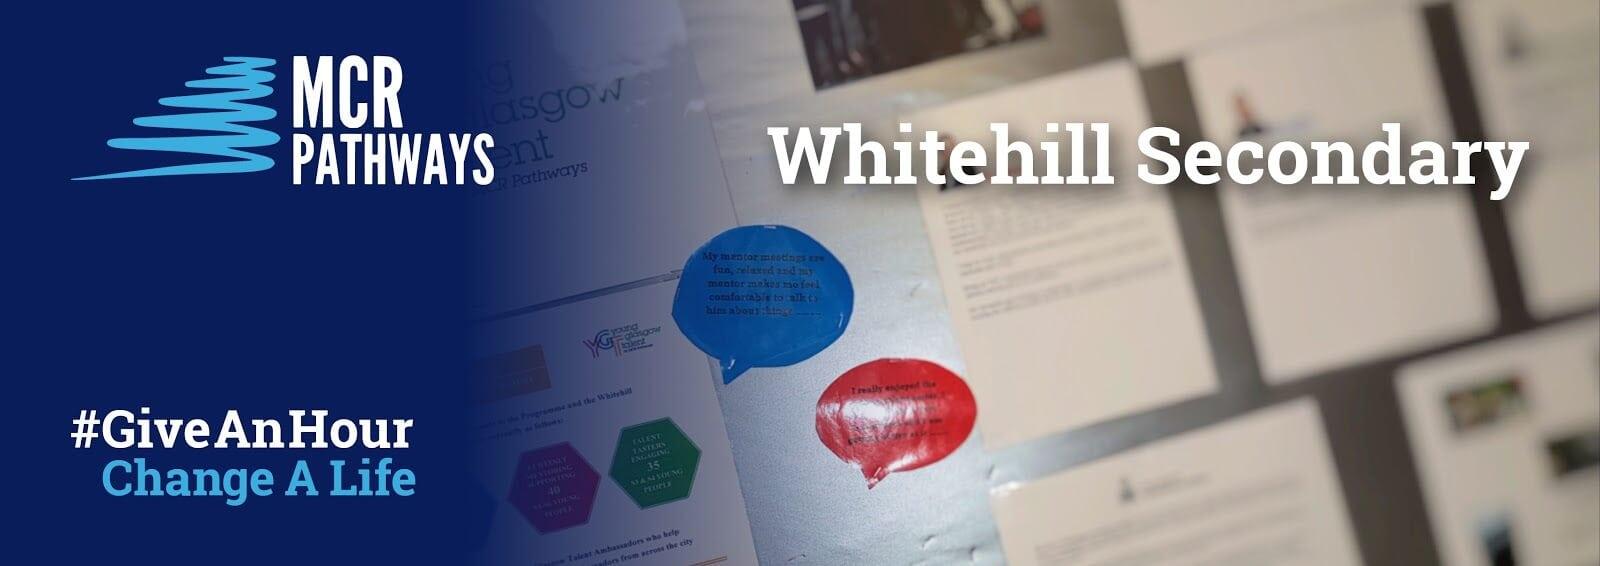 Whitehill Secondary